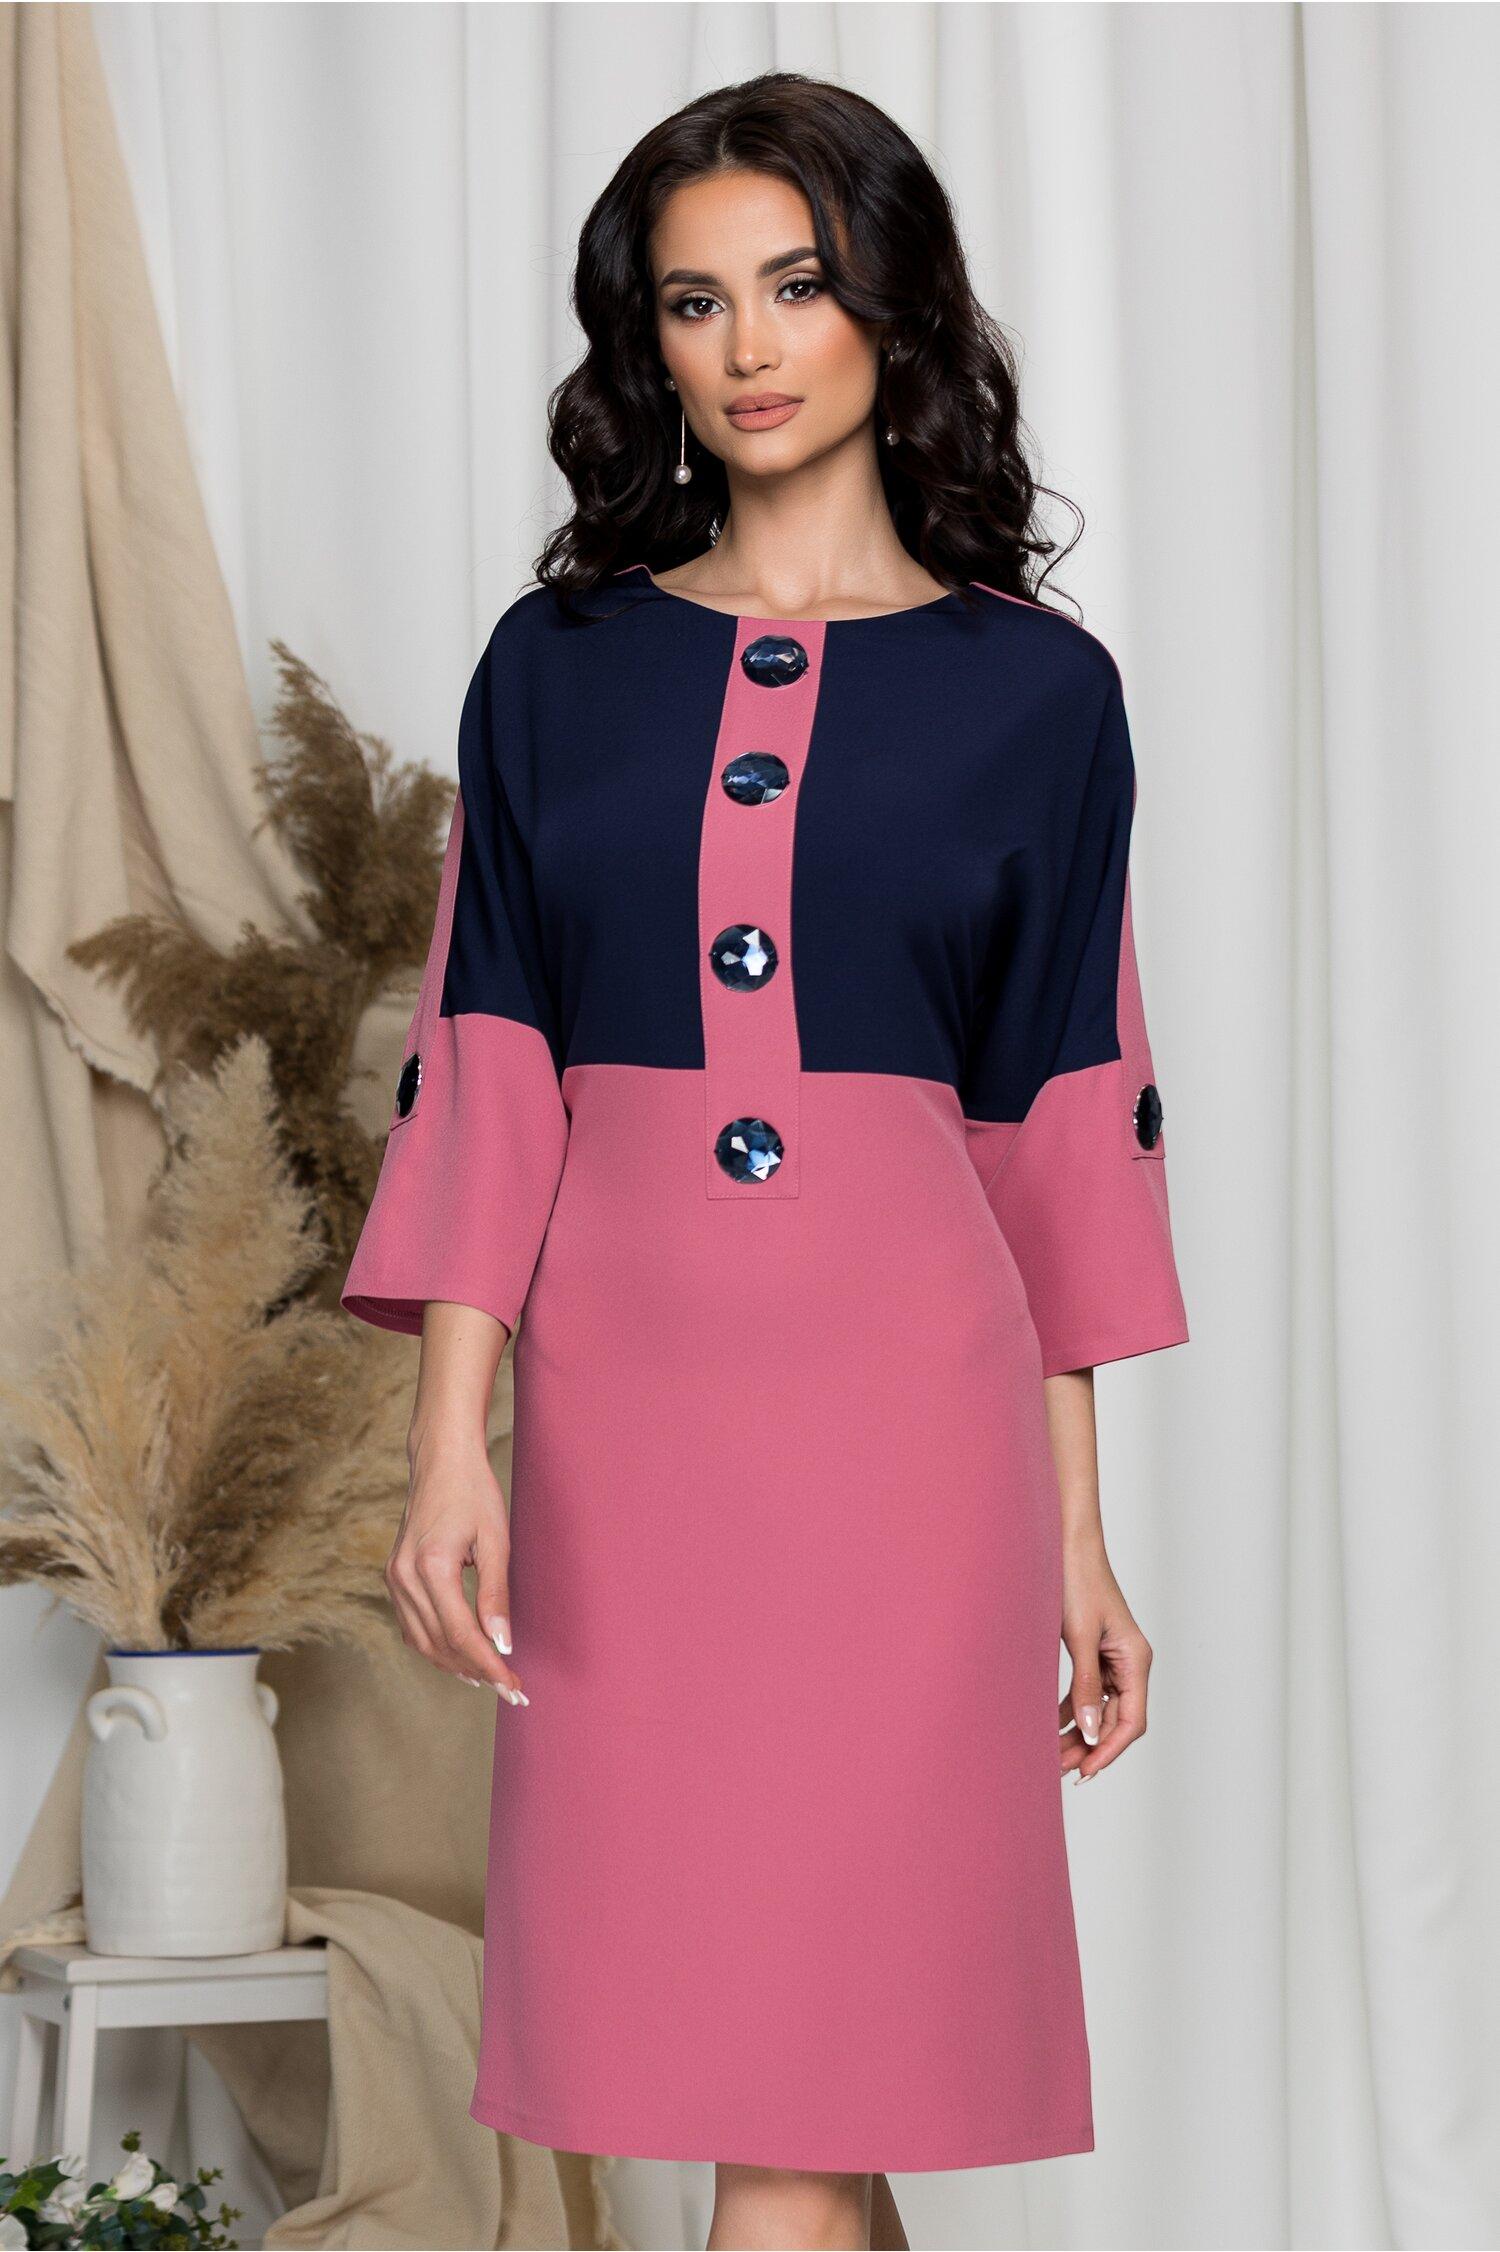 Rochie Nadia roz cu bleumarin si nasturi maxi stralucitori imagine dyfashion.ro 2021